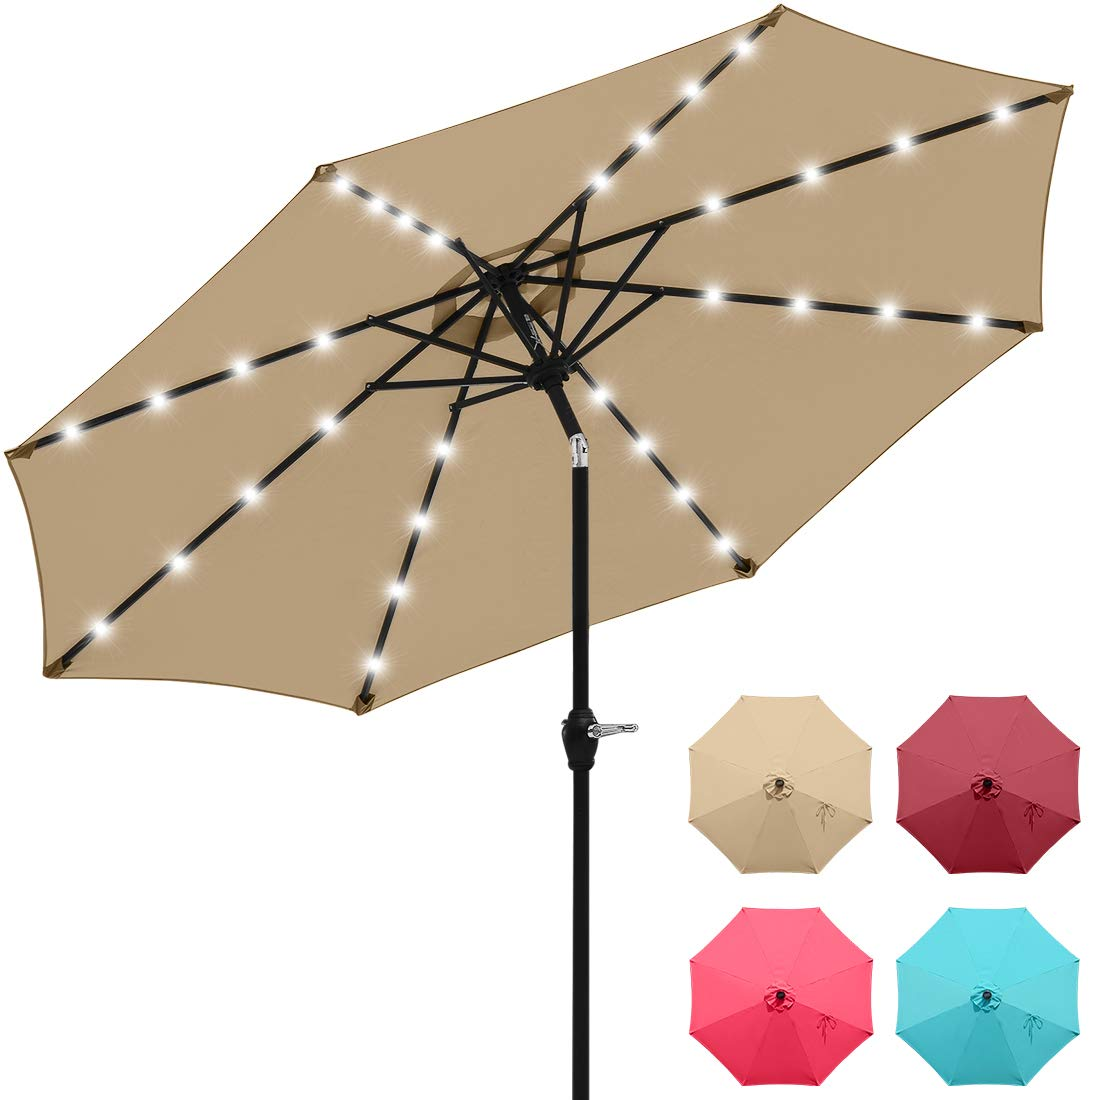 Beige HERMO 98S Roun 9 Ft Outdoor Patio 8 Ribs Market Table Umbrella